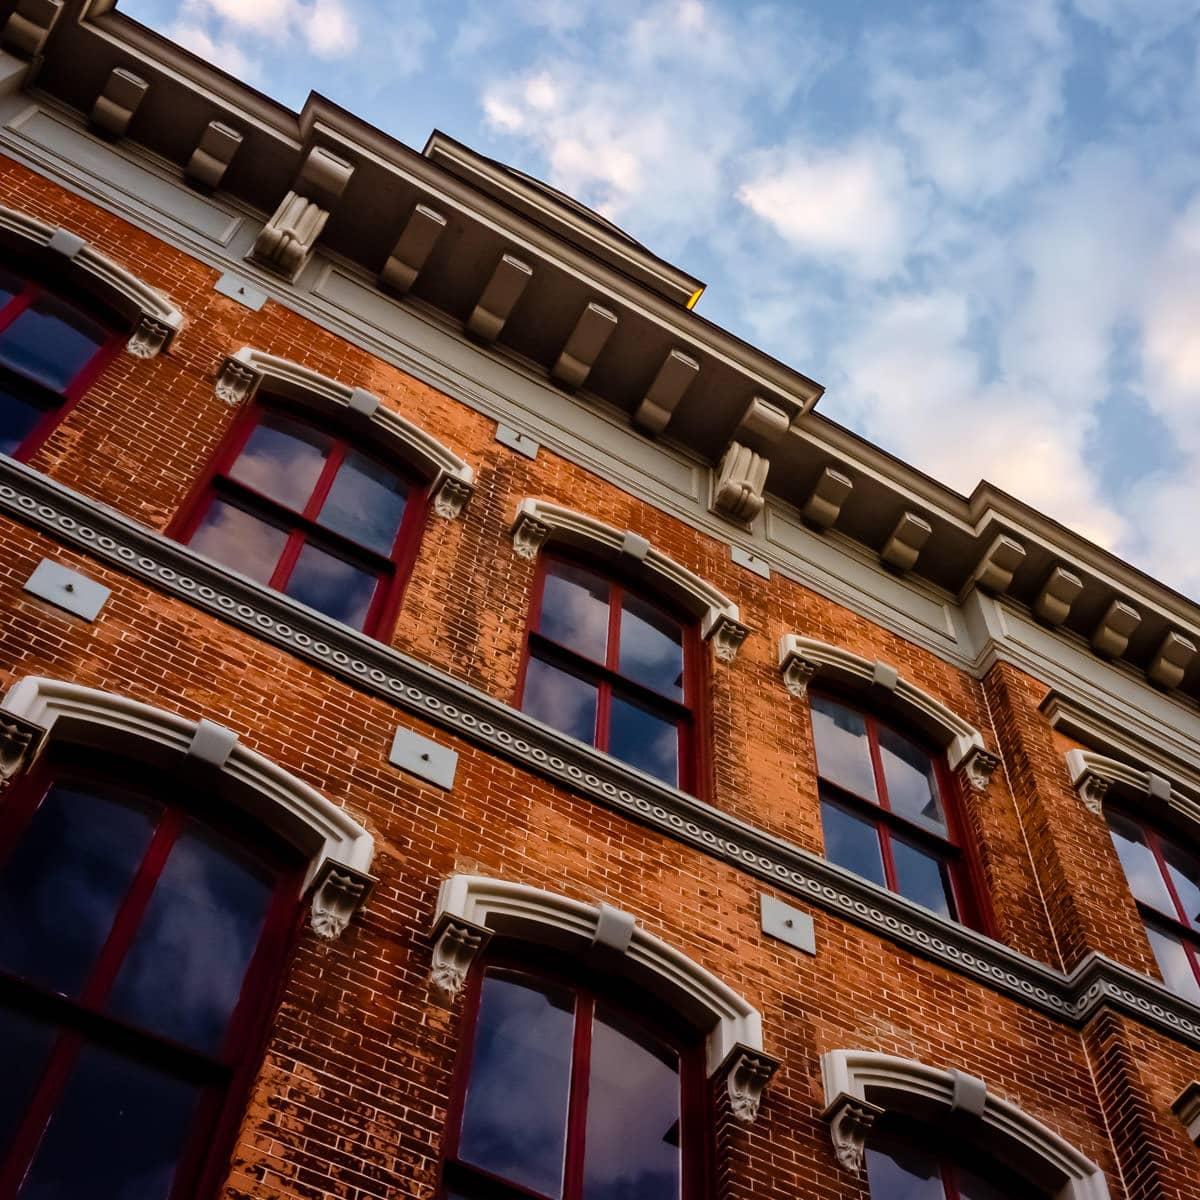 Detail of the façade of a historic building along Galveston, Texas' Victorian-era Strand Historic District.